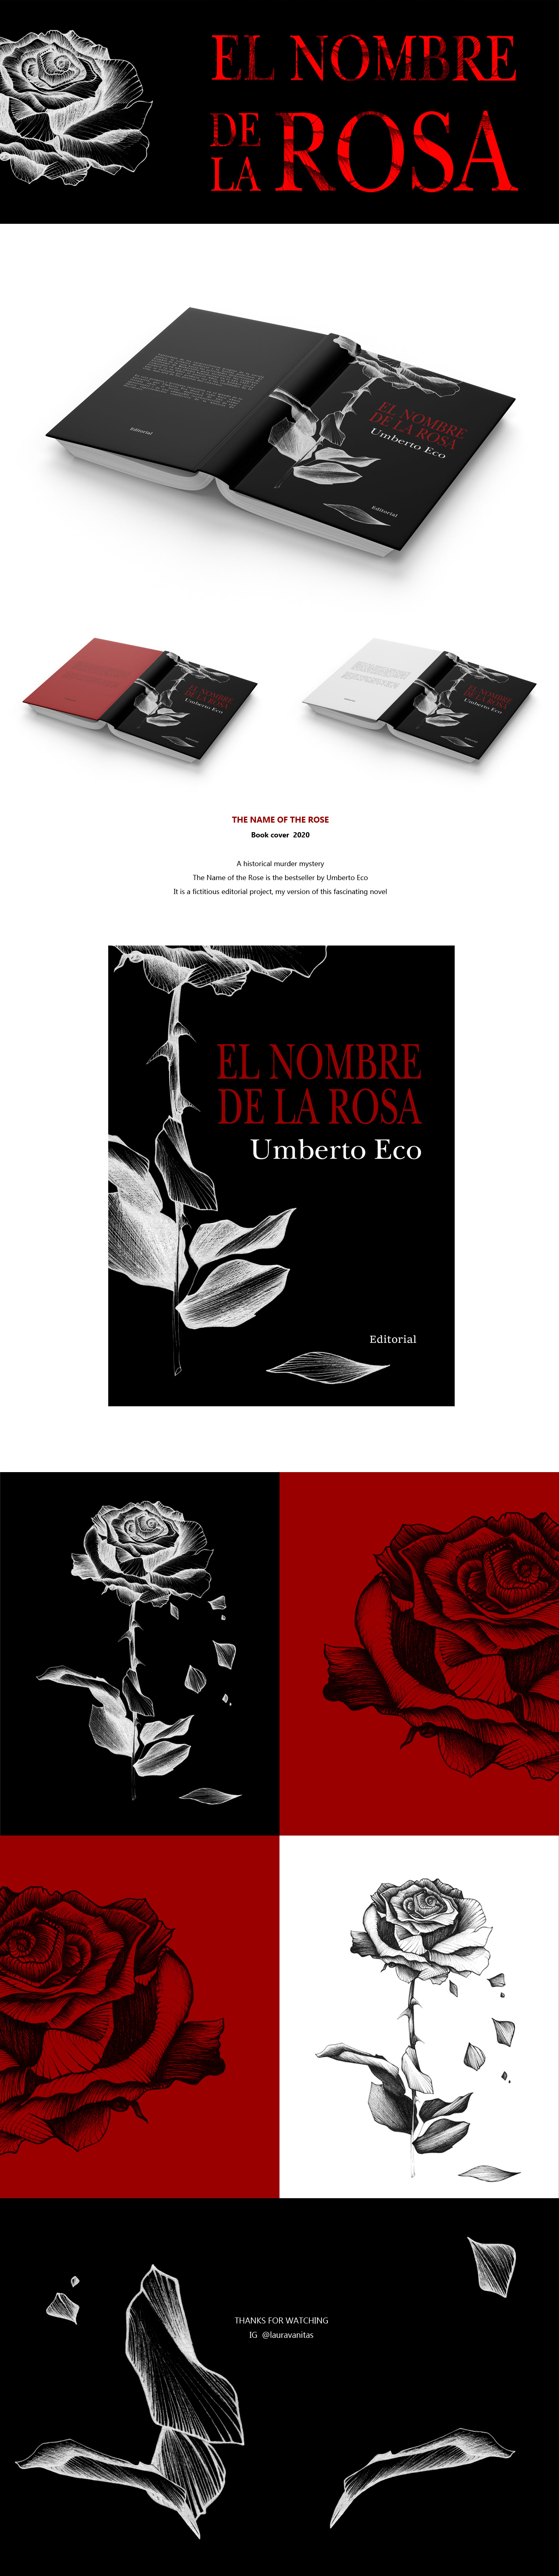 book bookcover books cubierta editorialdesign flower ILLUSTRATION  libro rosa rose